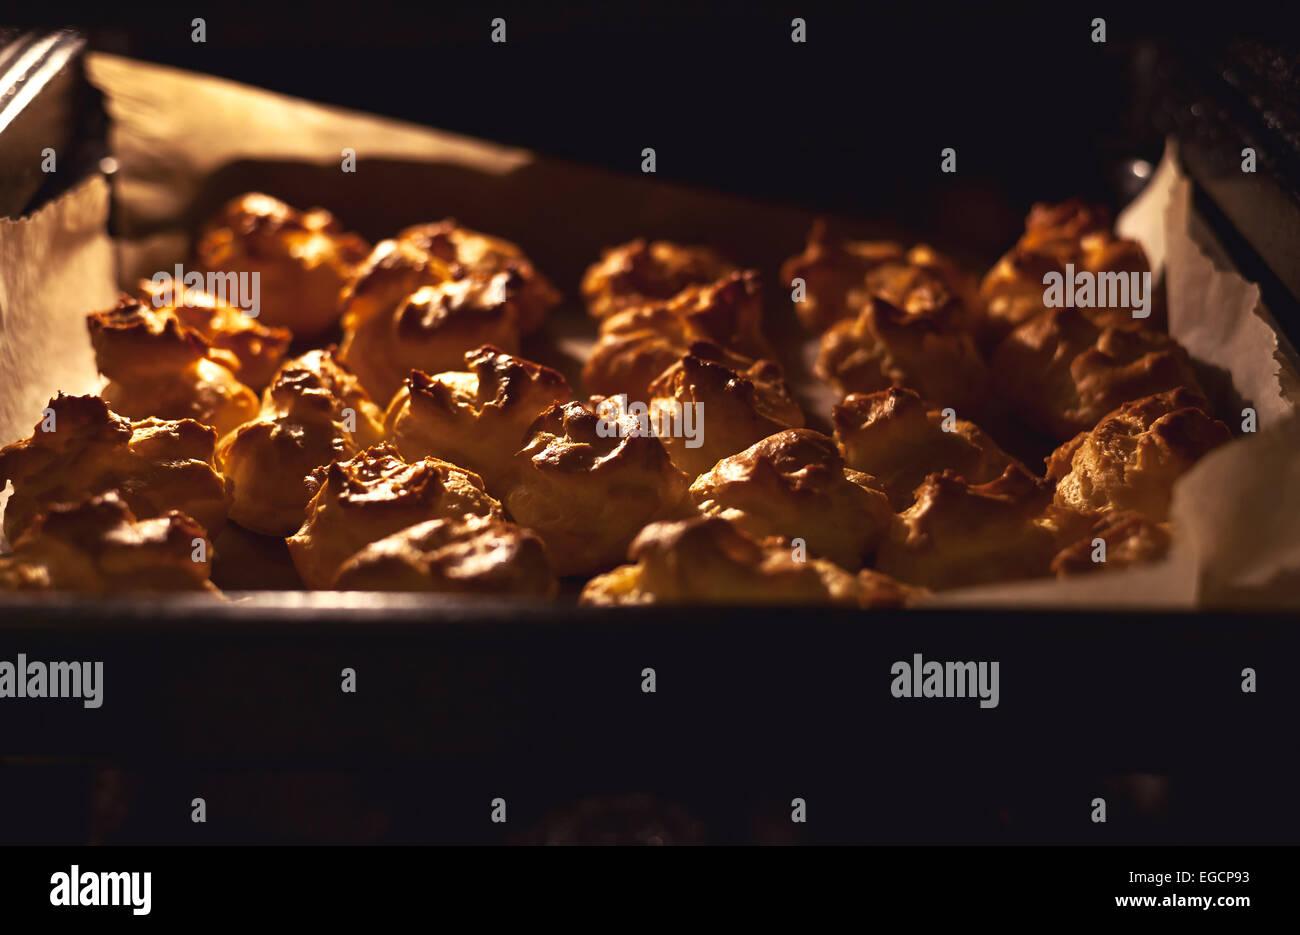 Preparing sweet tasty buns for pudding cake. - Stock Image